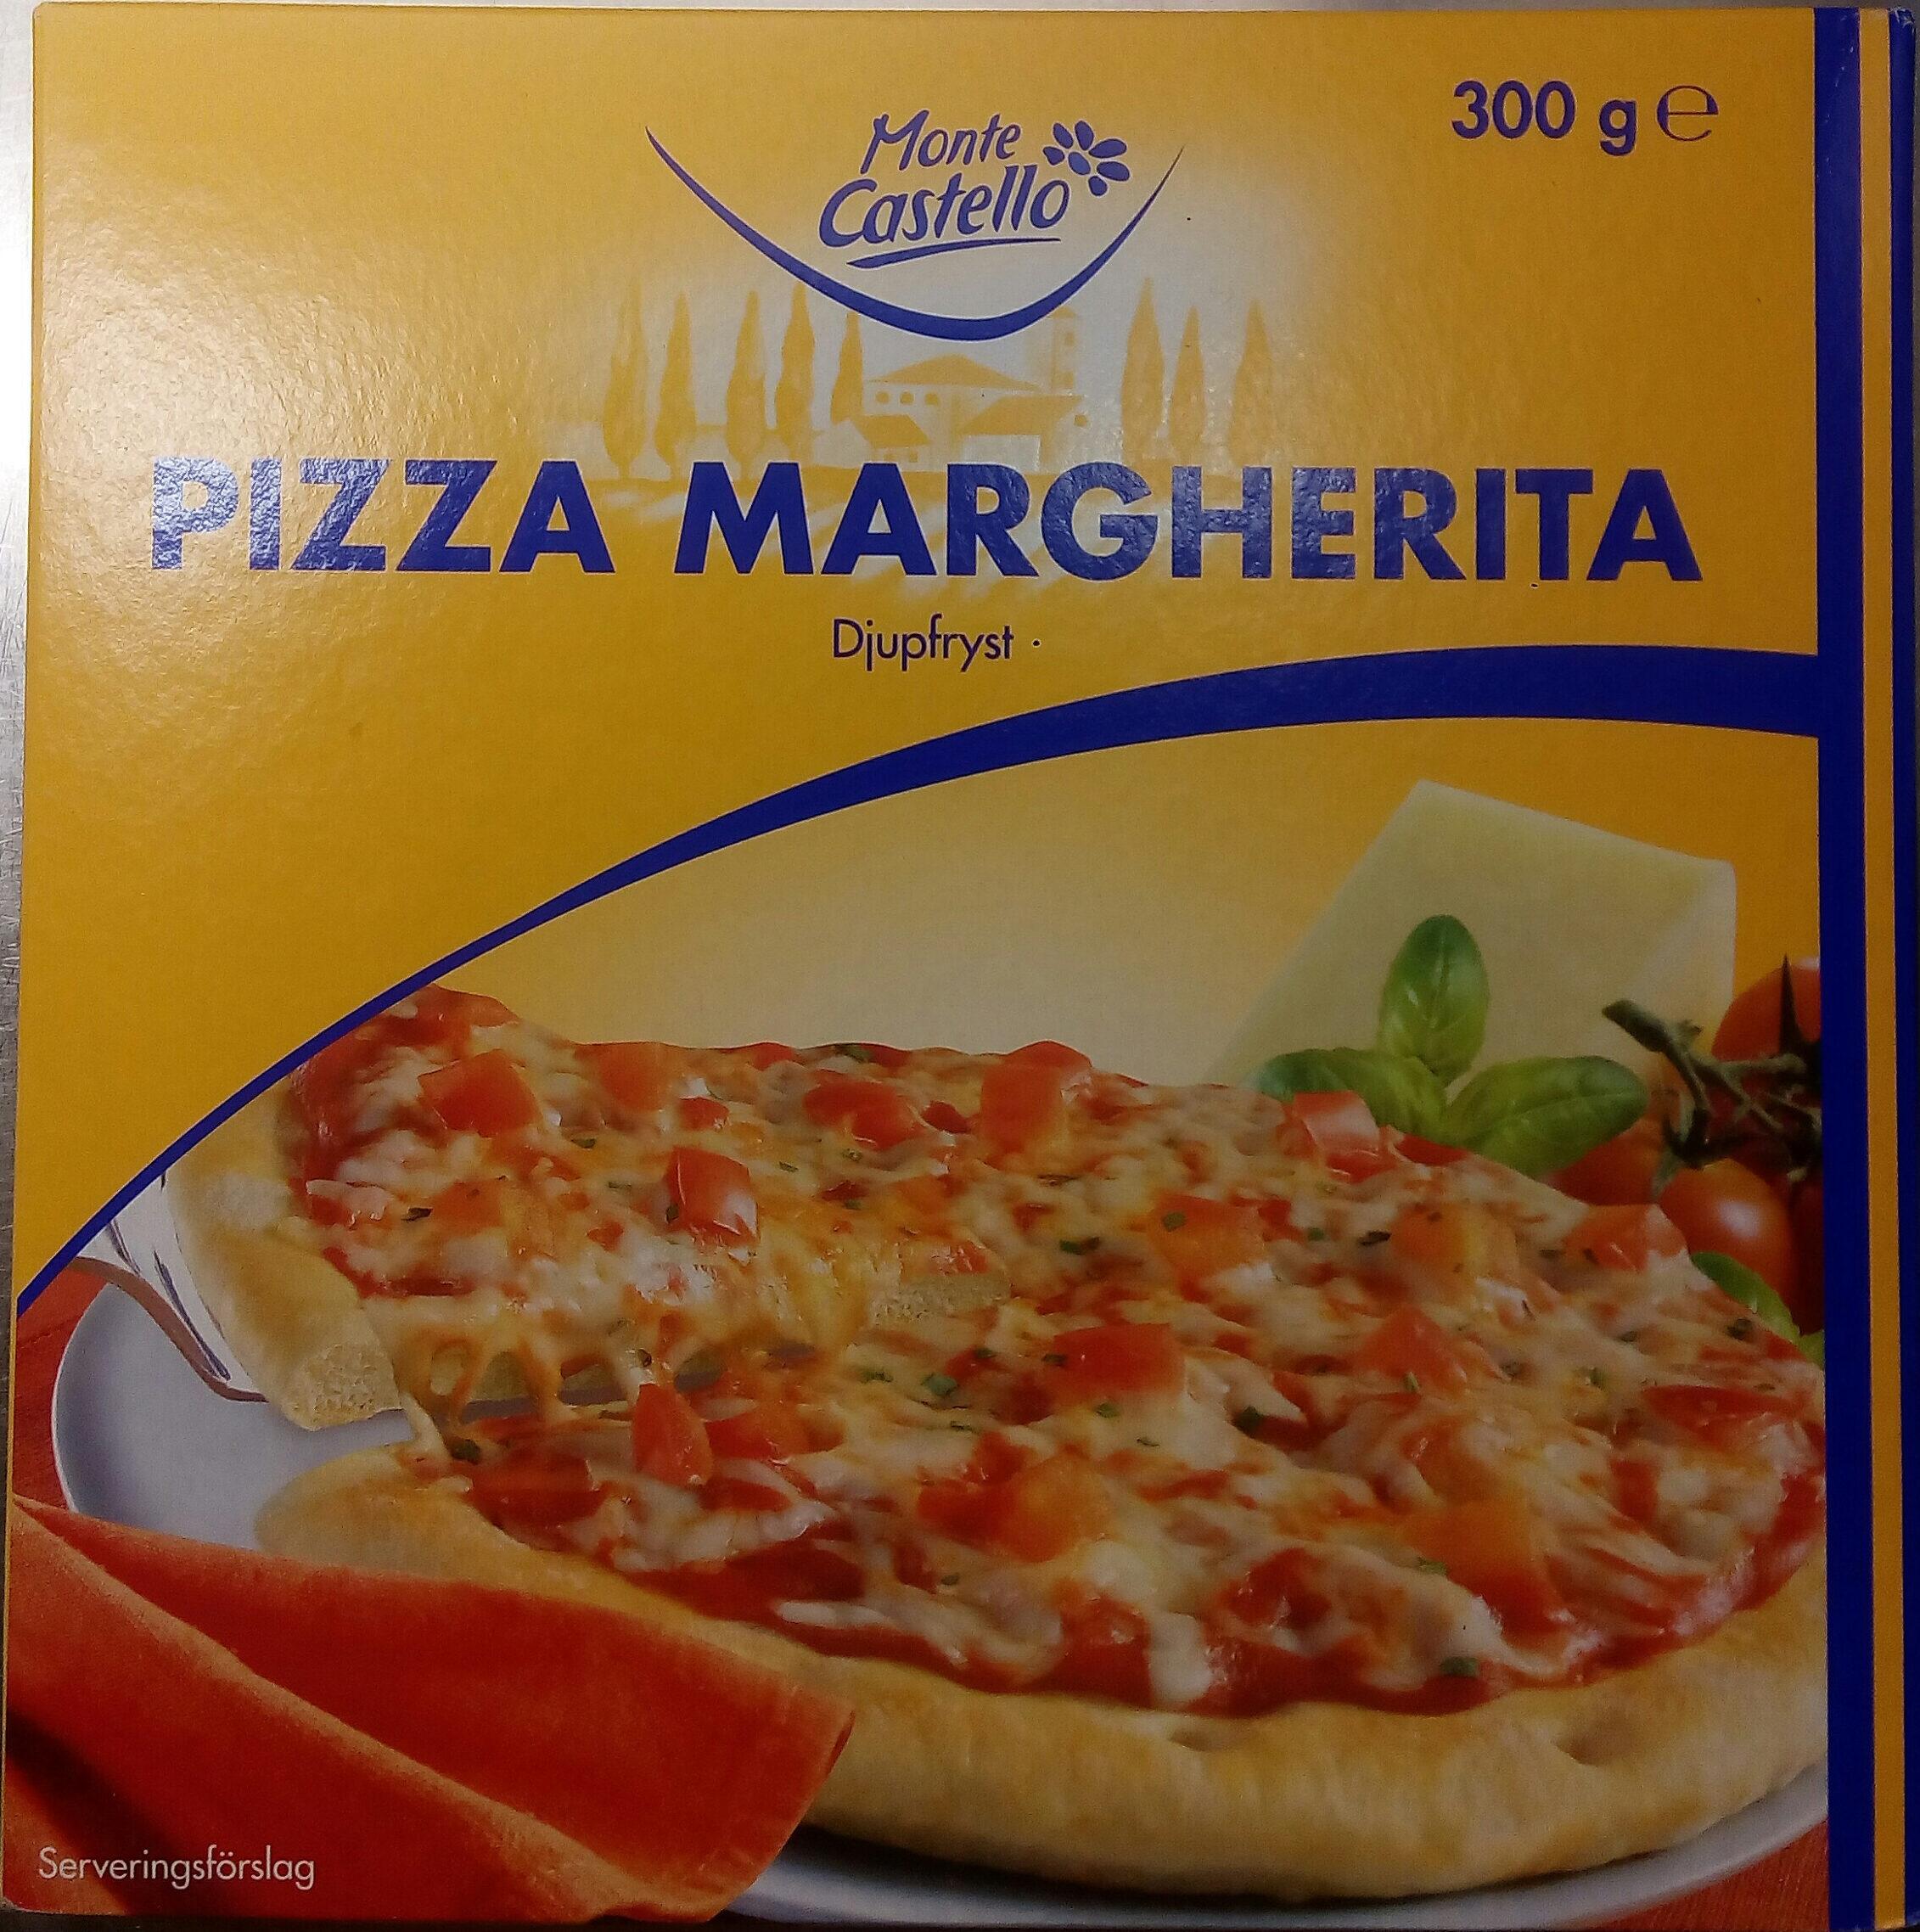 Monte Castello Pizza Margherita - Produit - sv